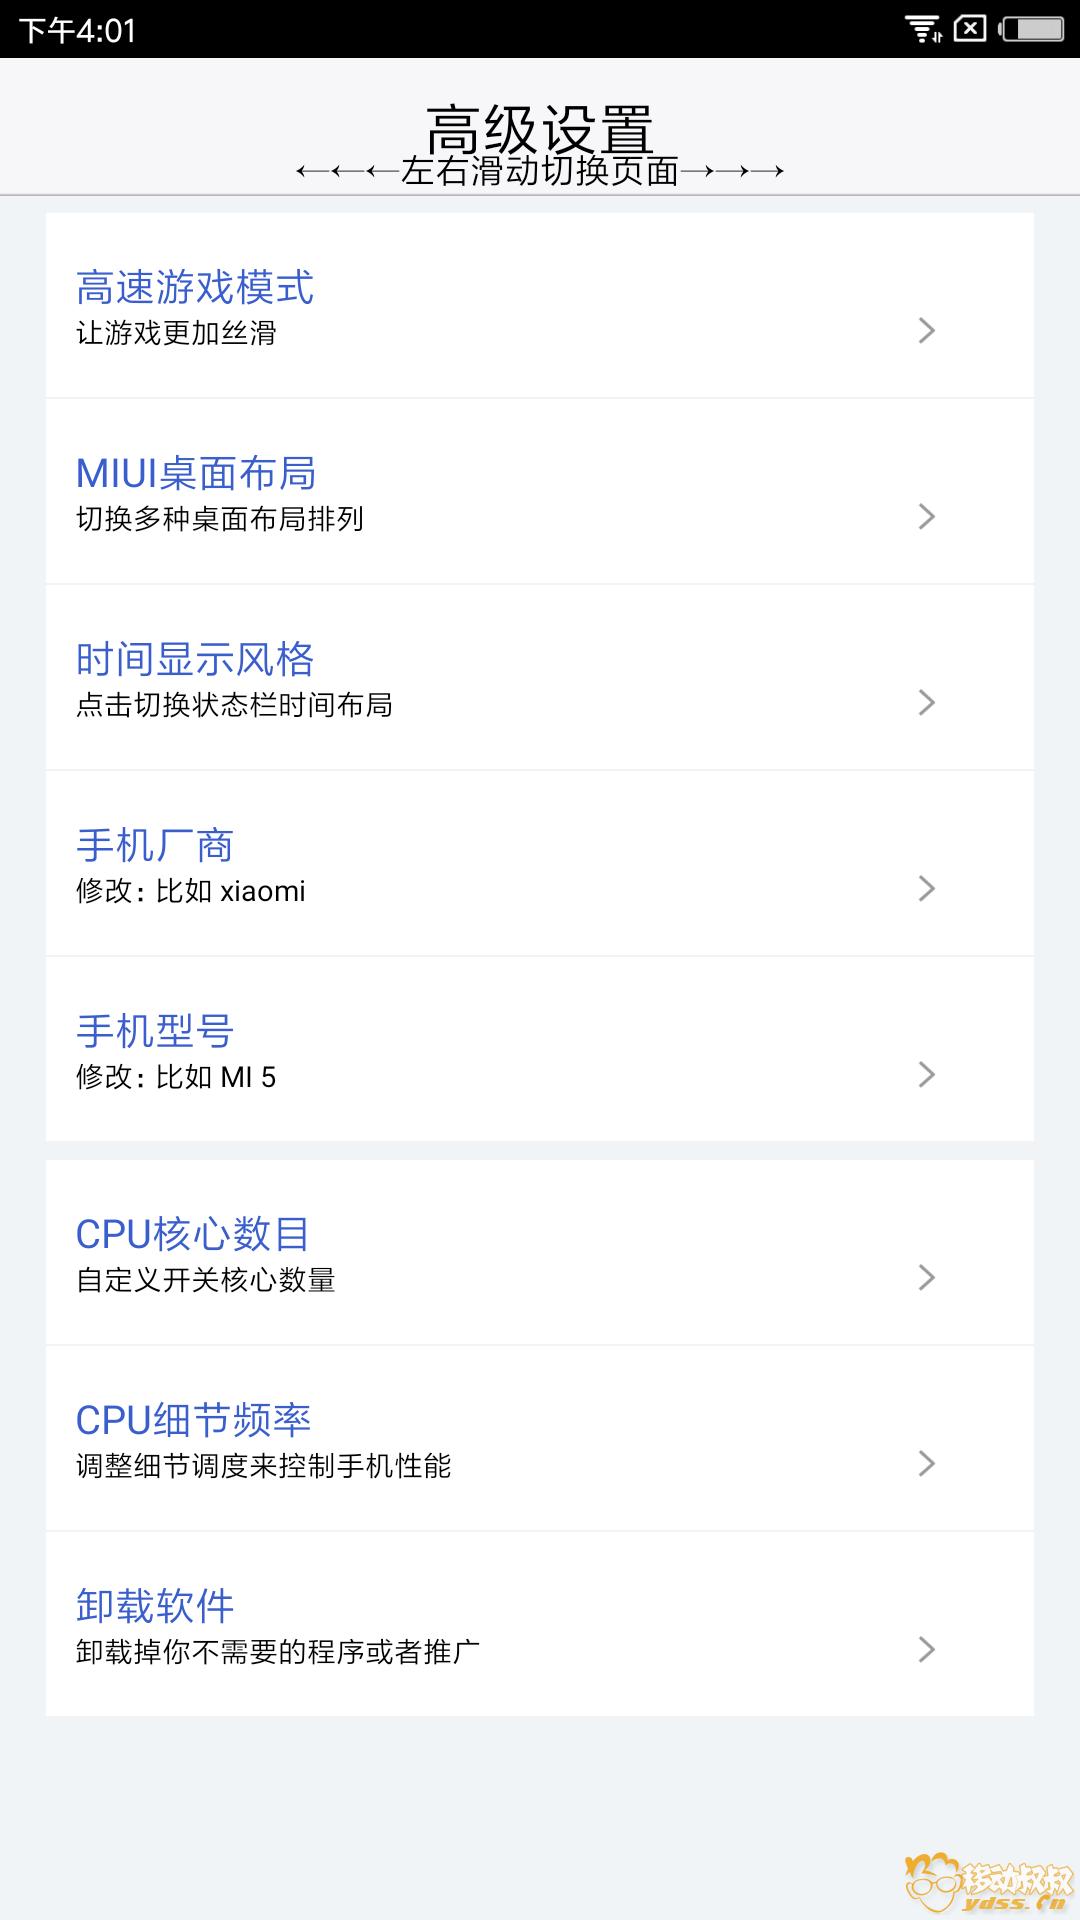 Screenshot_2018-04-10-16-01-12-807_com.pingfan.settings.png